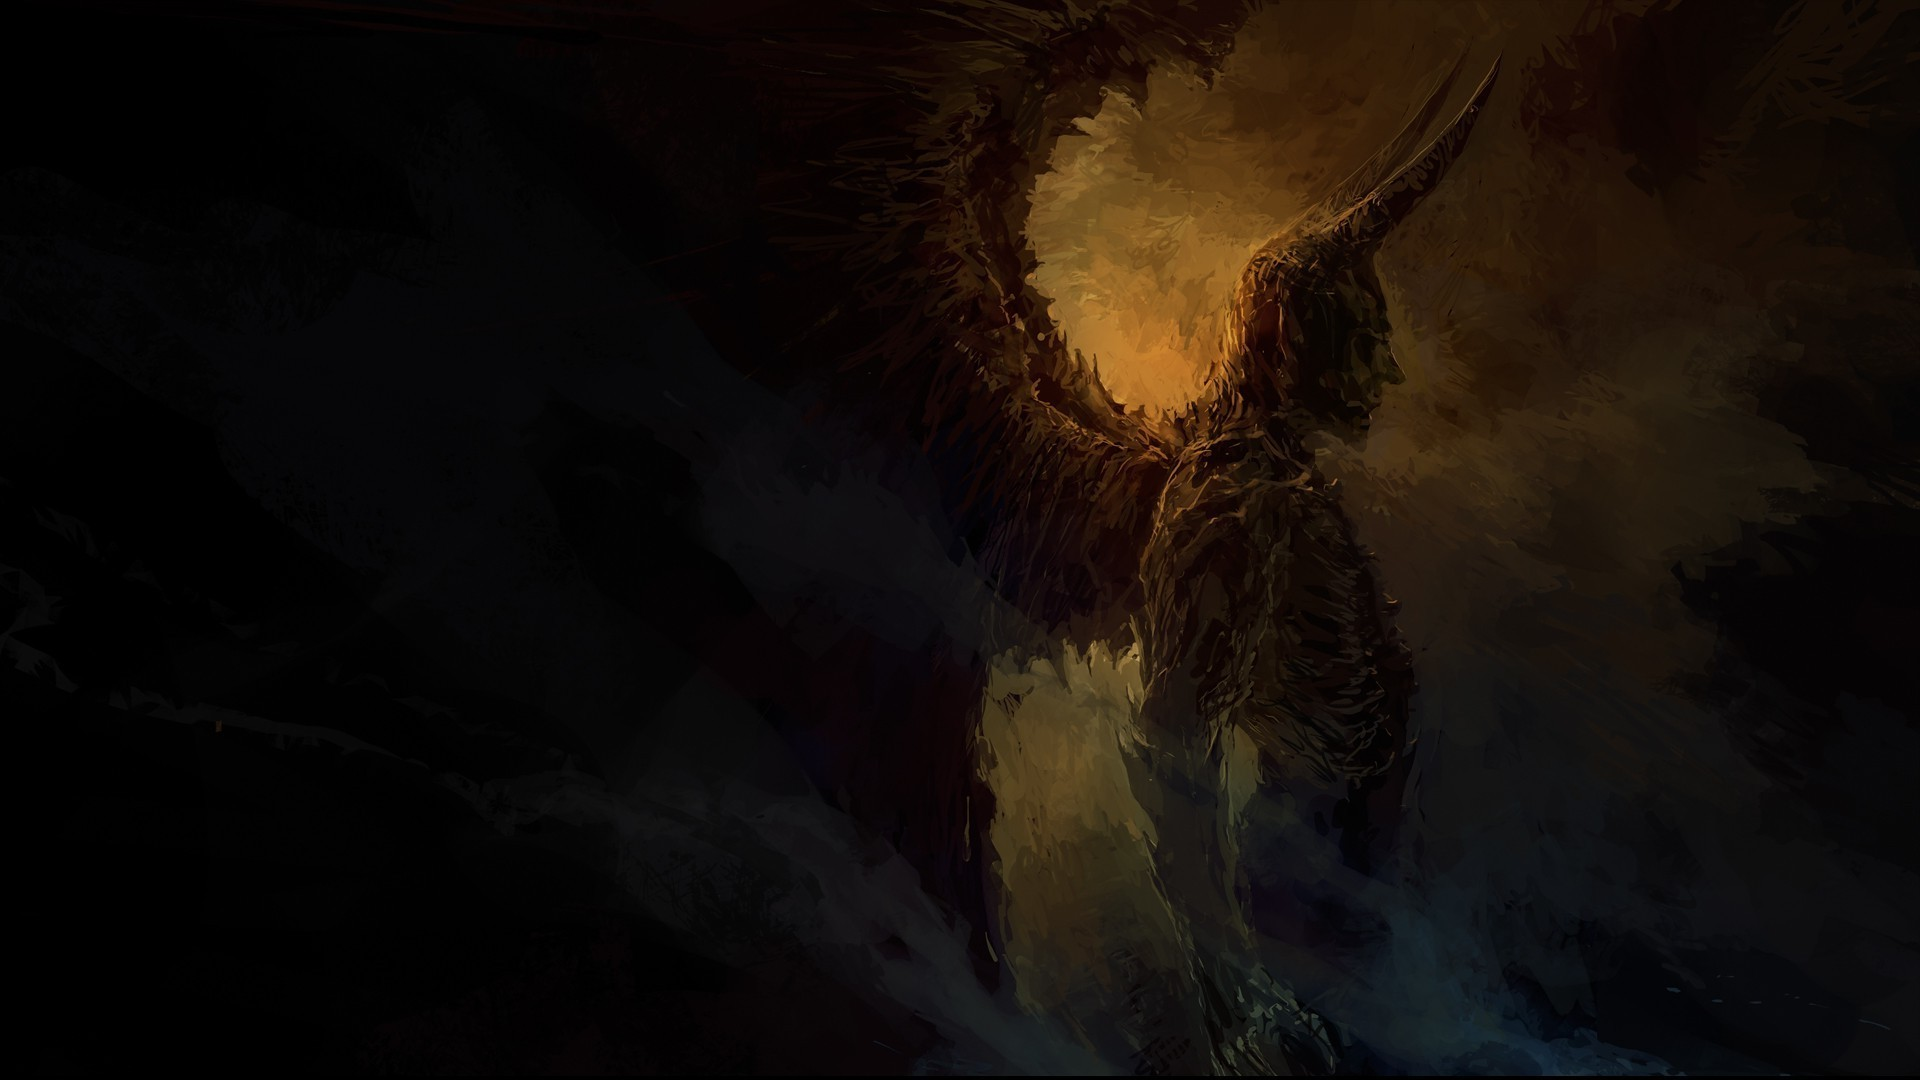 heaven dragon vs hell dragon